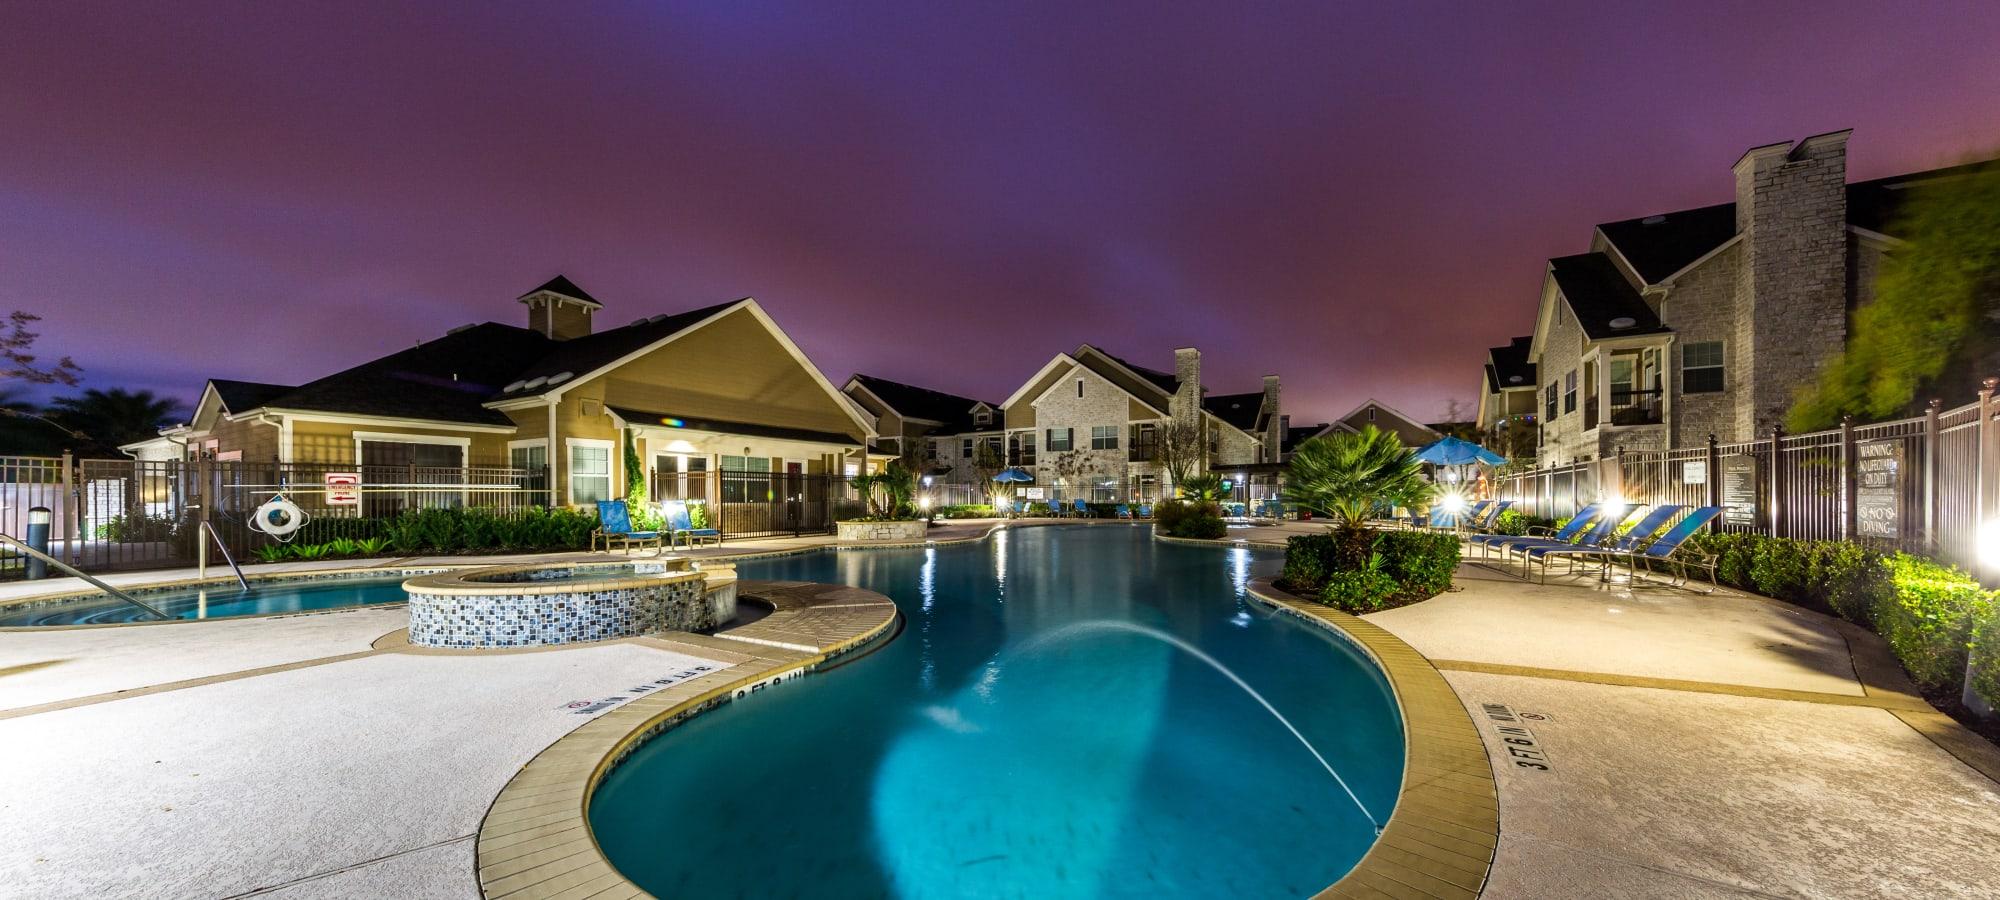 Apartments at Marquis at Cinco Ranch in Katy, Texas